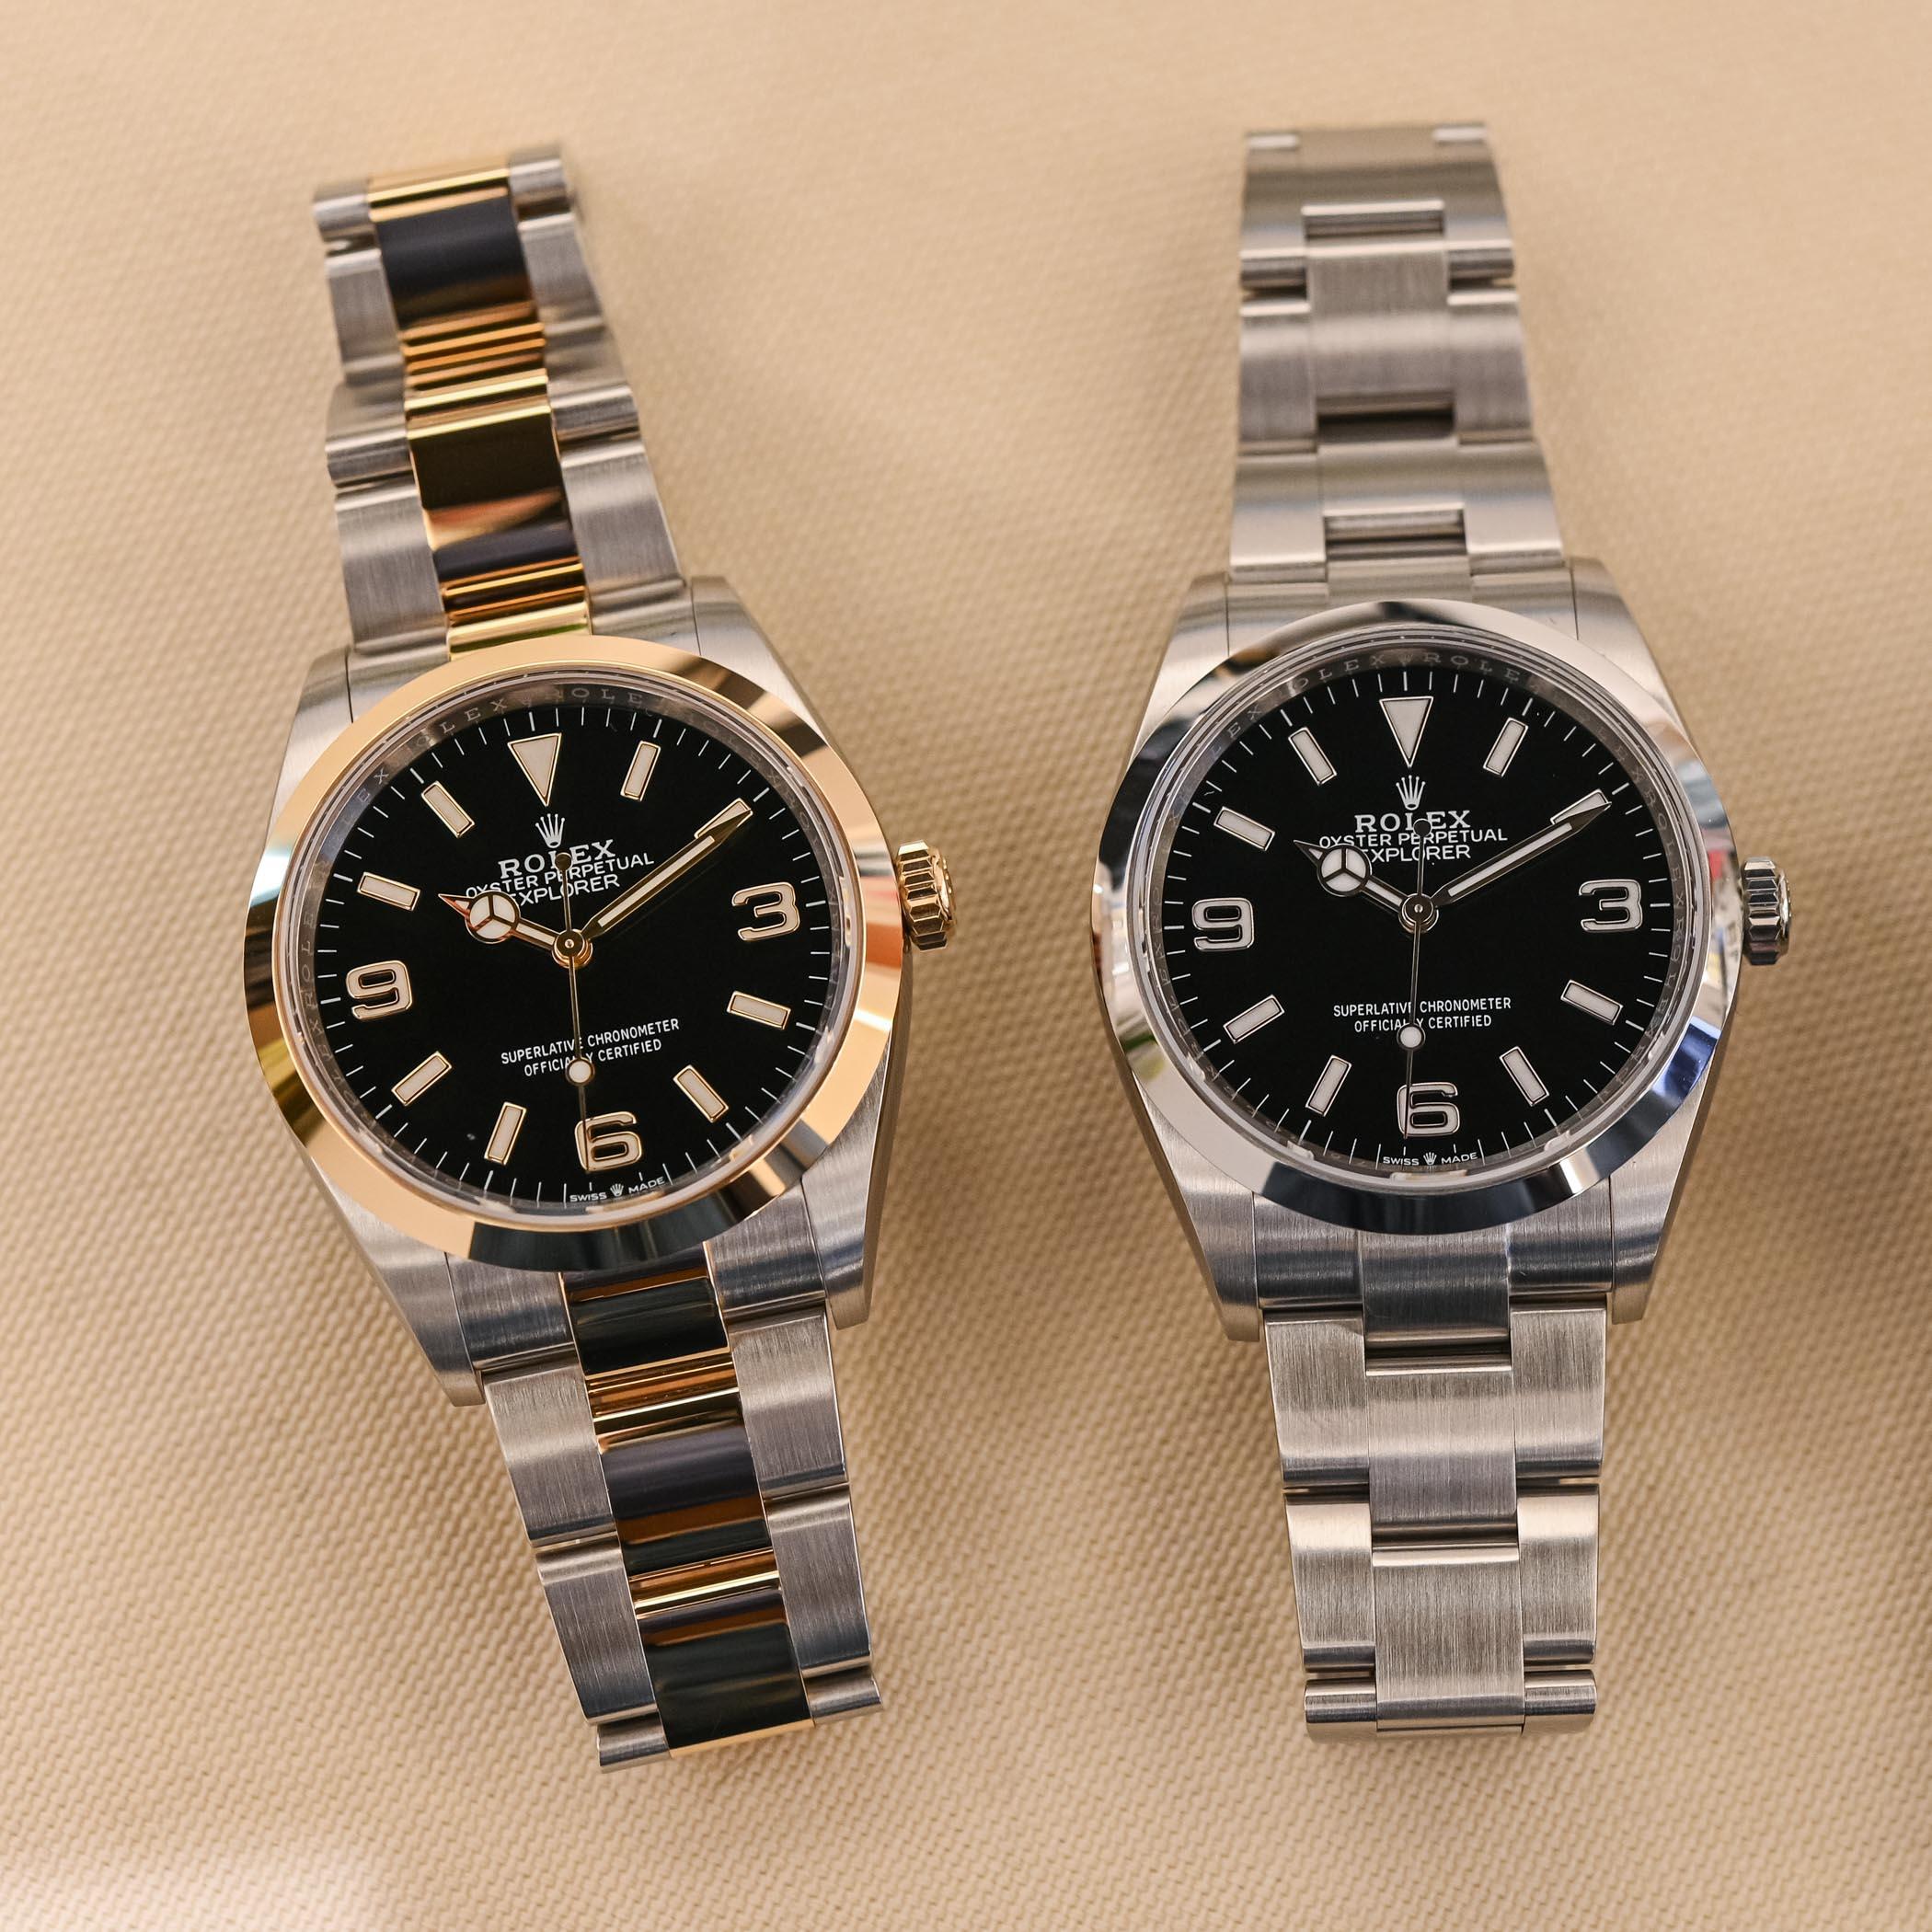 2021 Rolex Explorer 1 36mm 124270 - 124273